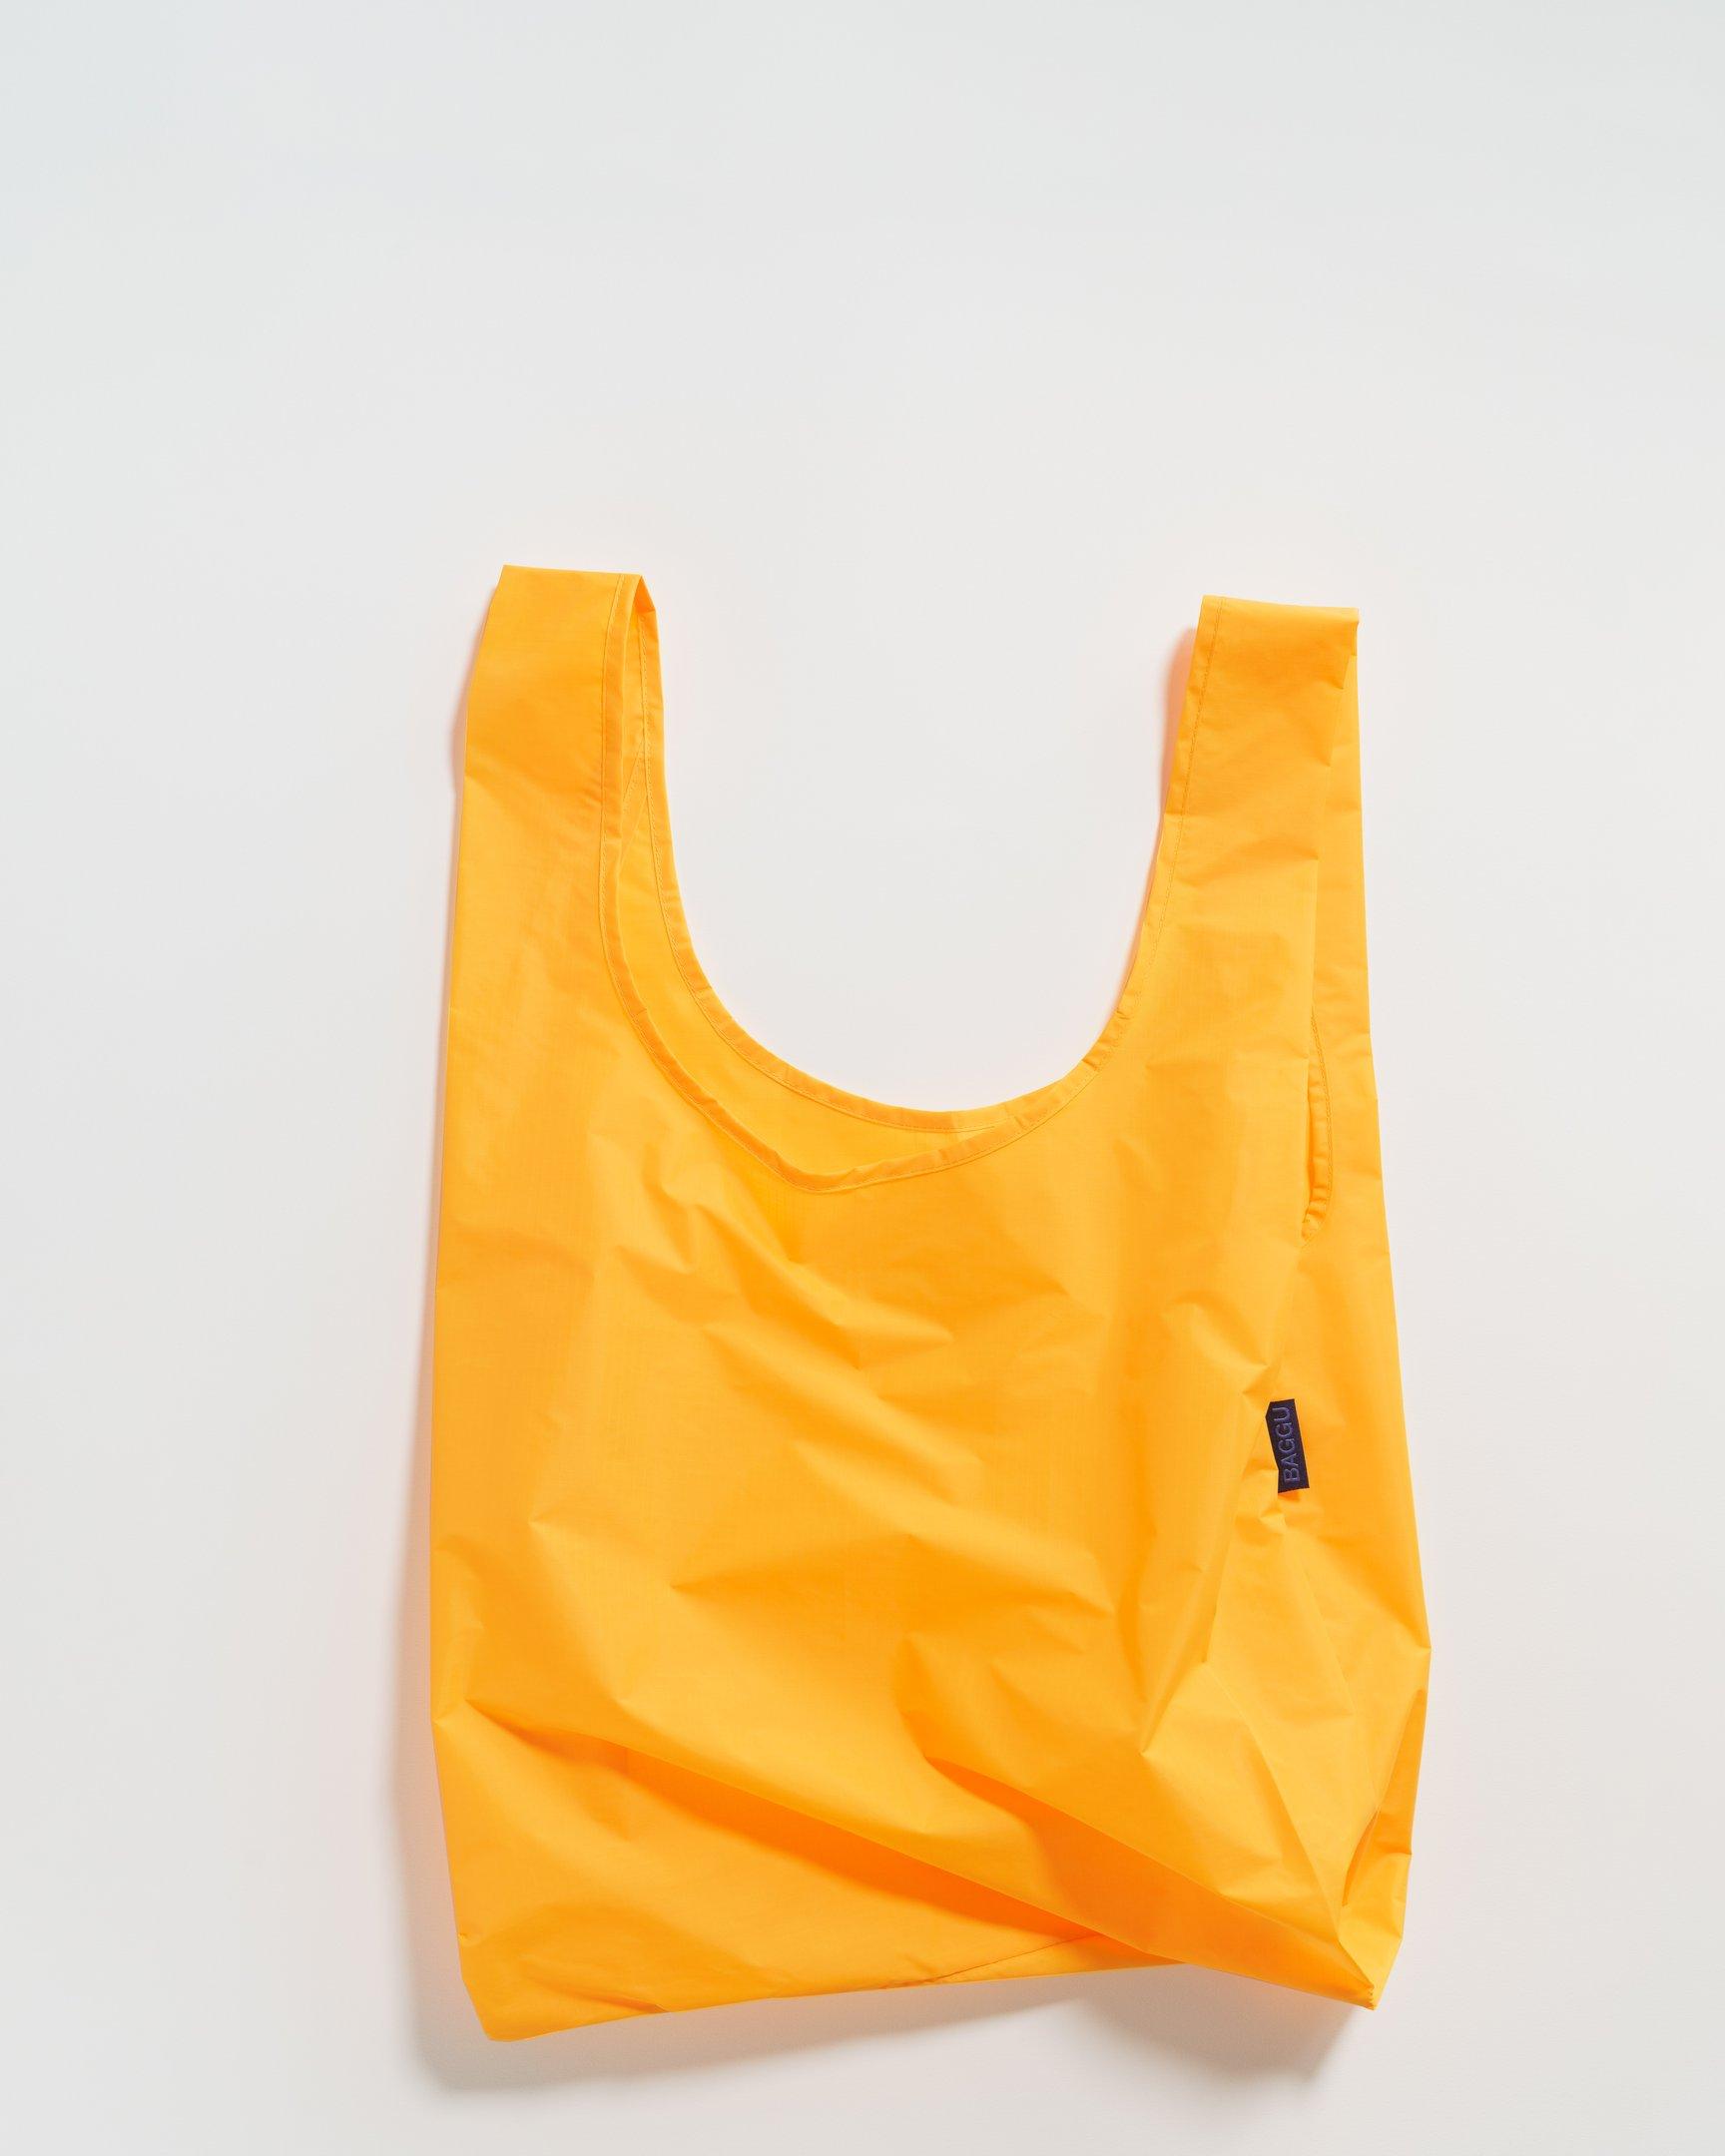 BAGGU Einkaufsbeutel Electric Saffron